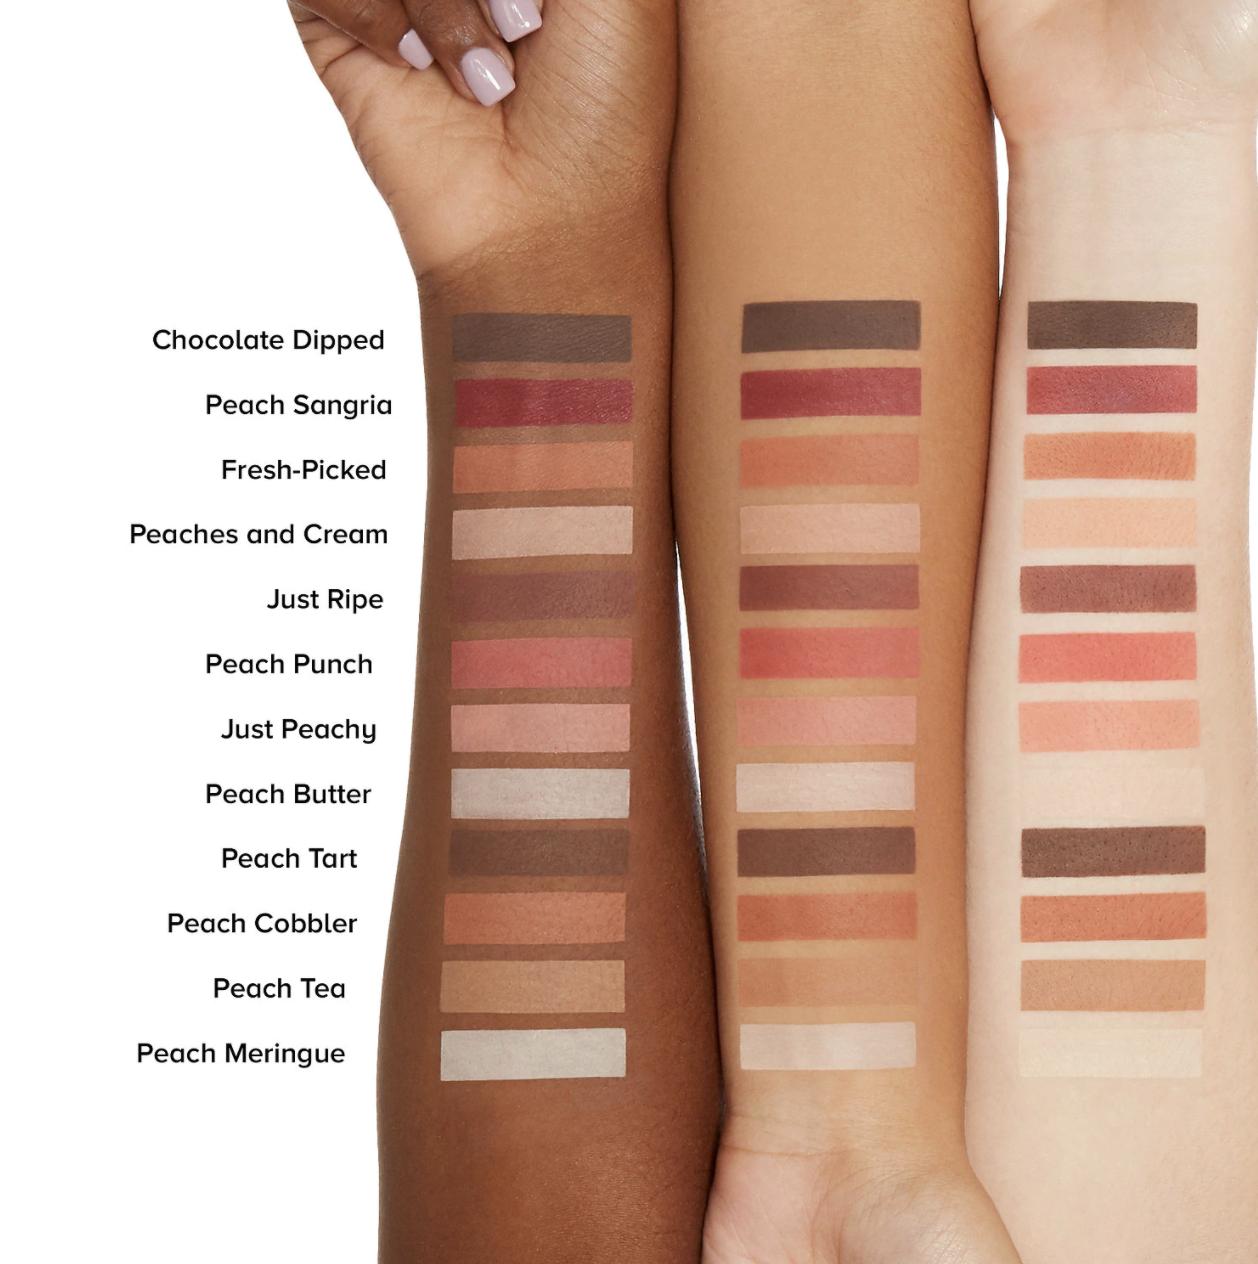 Swatches ranging from light pinks, medium pinks, and deep browns across light, medium,  and deep skin tones